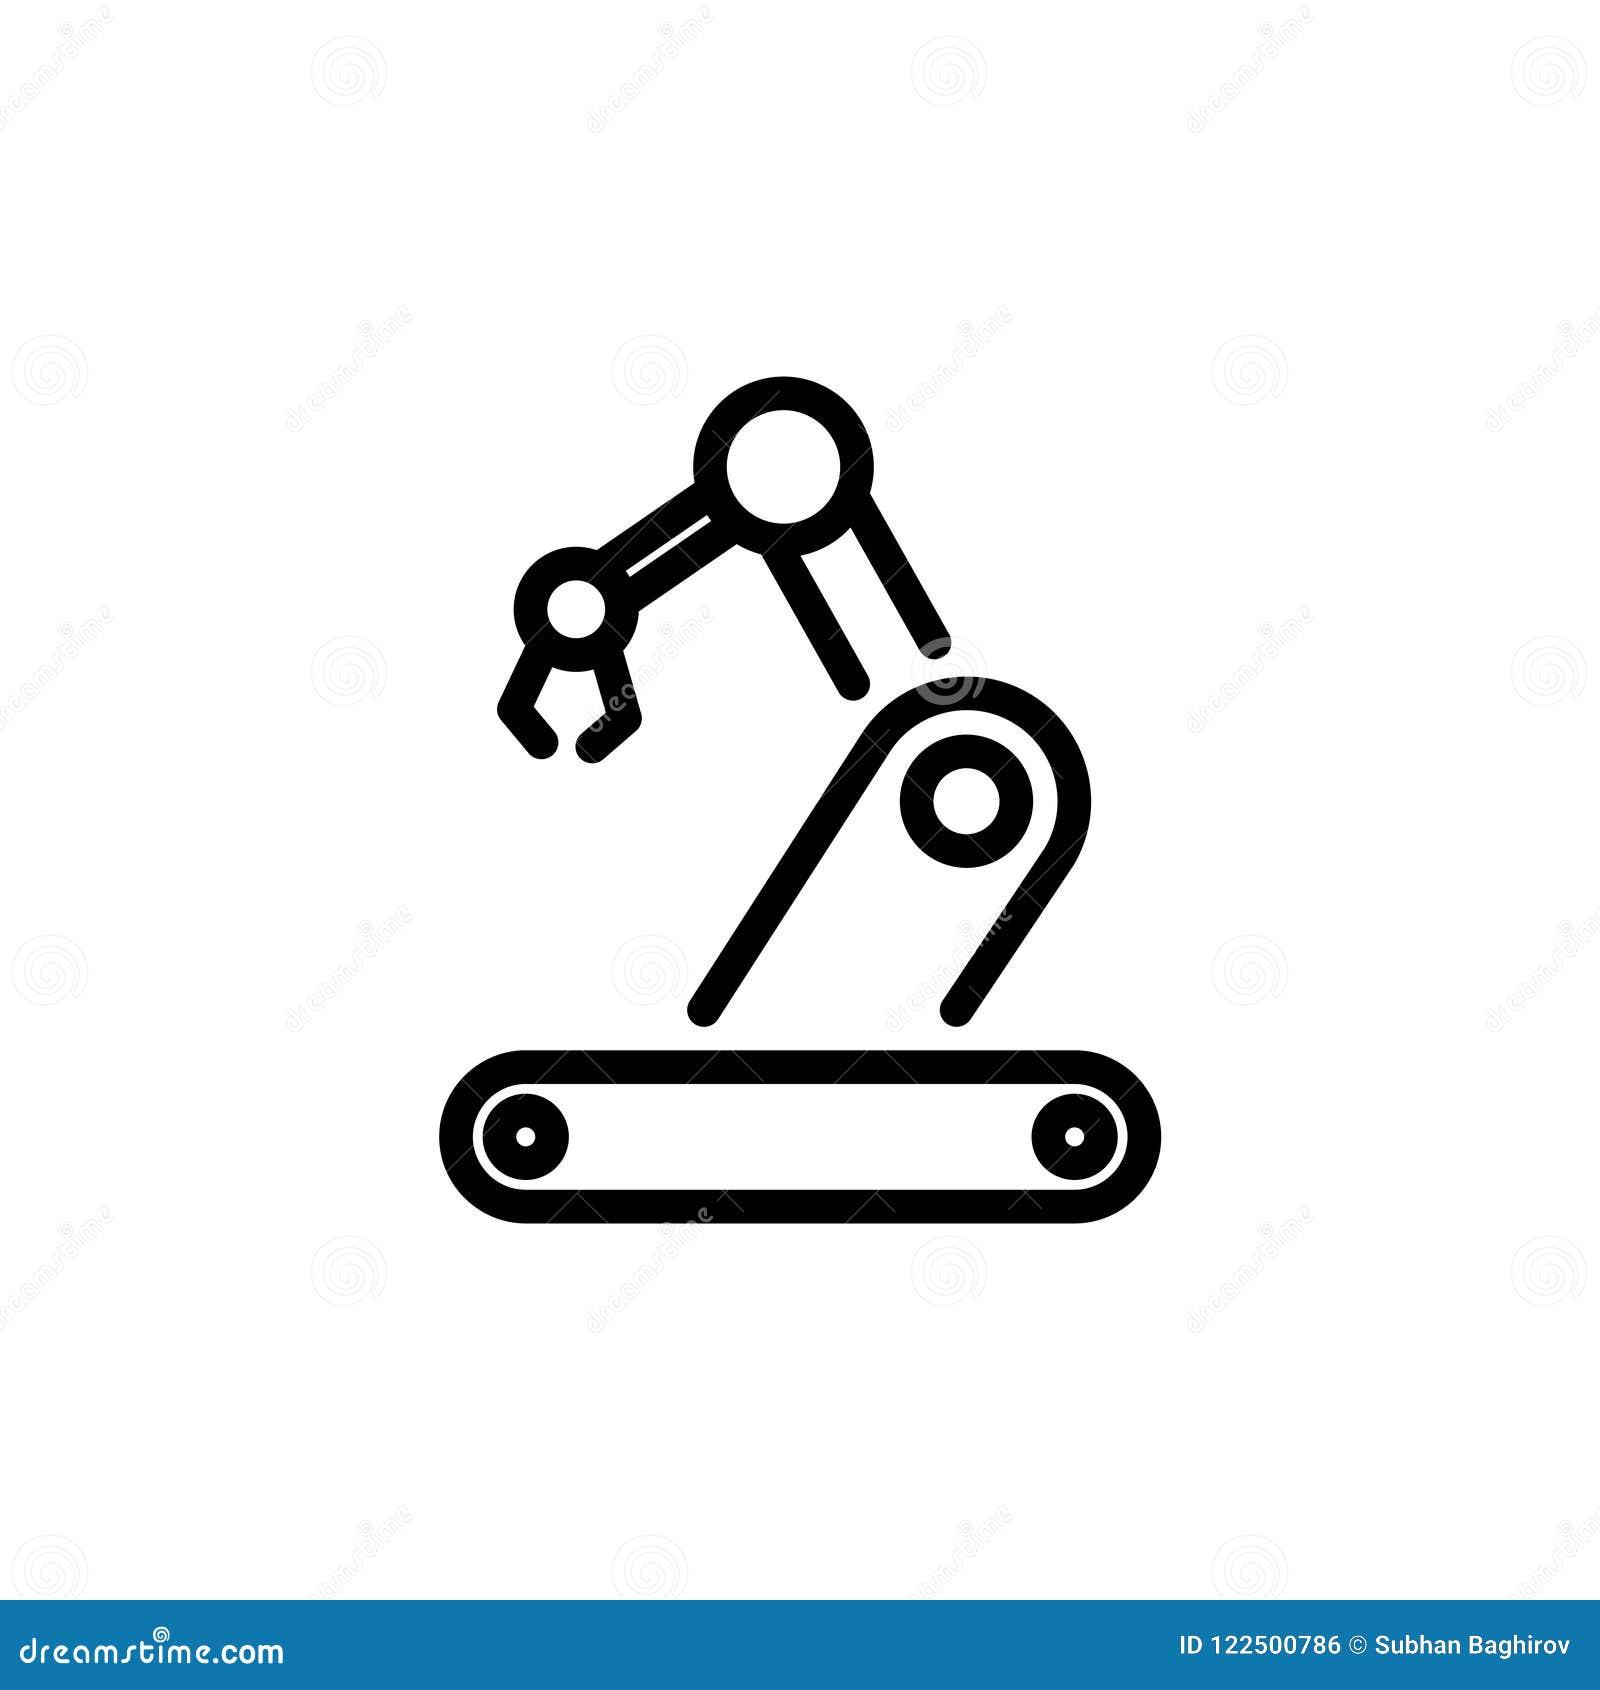 Robotics Icon Simple Flat Style Outline Illustration Stock Vector